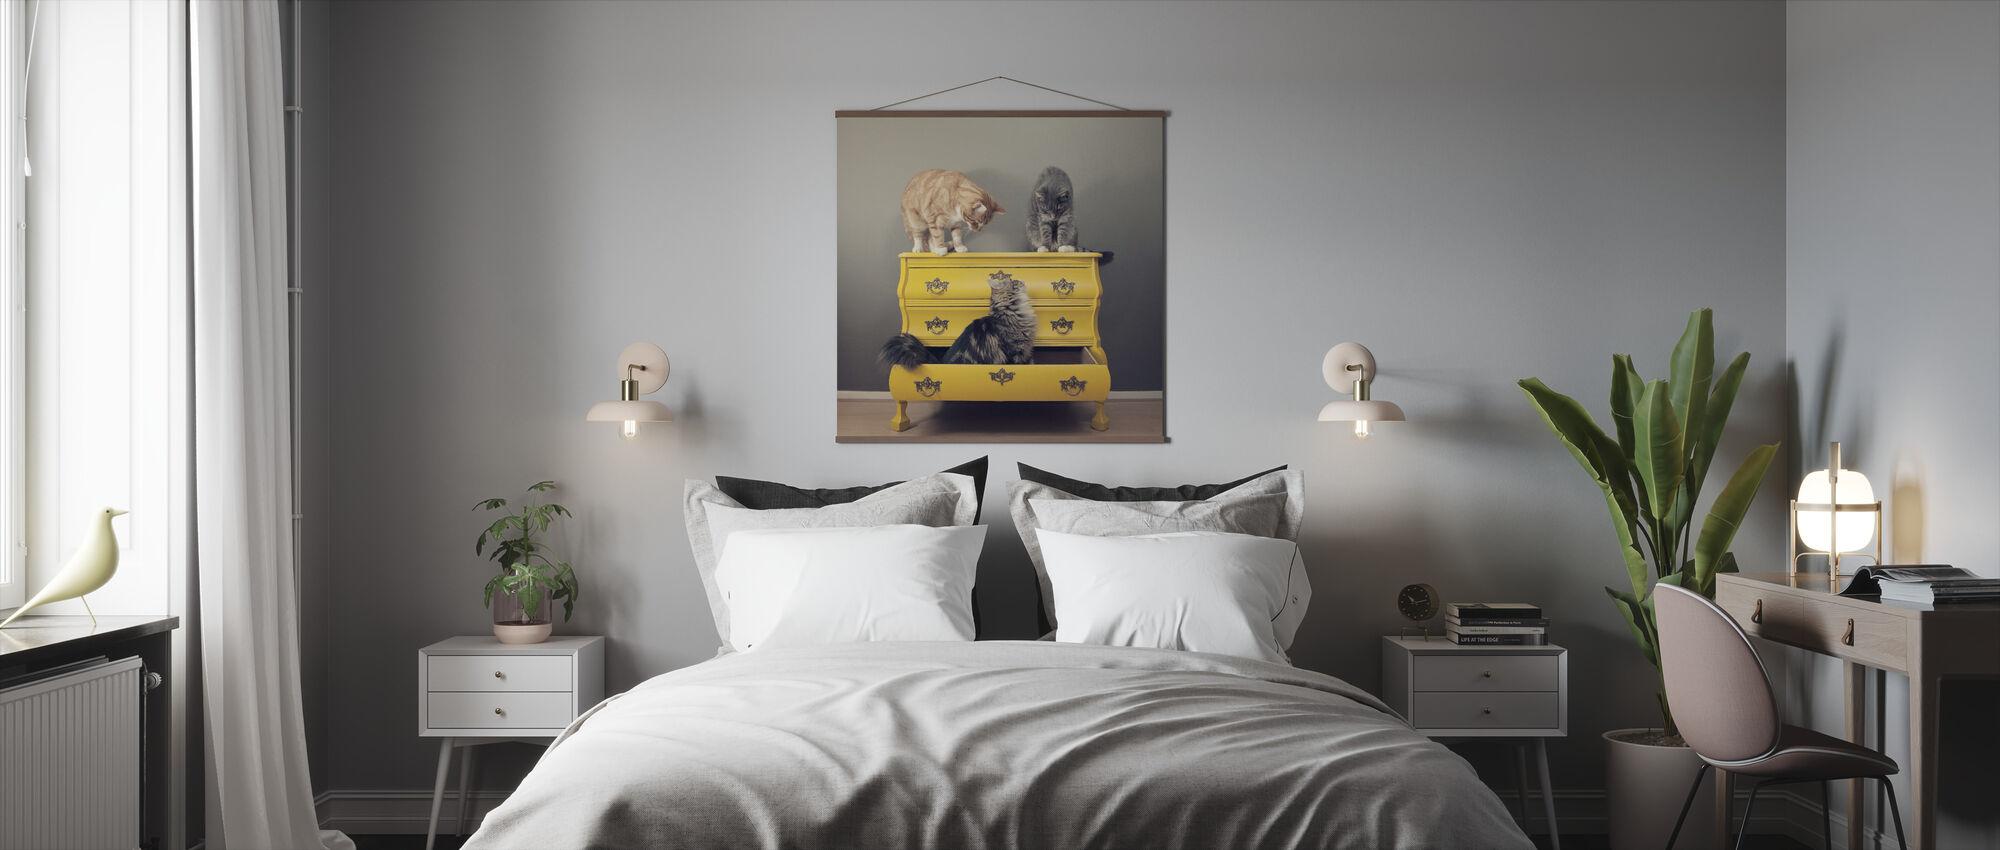 Meeting in a Yellow Bureau - Poster - Bedroom